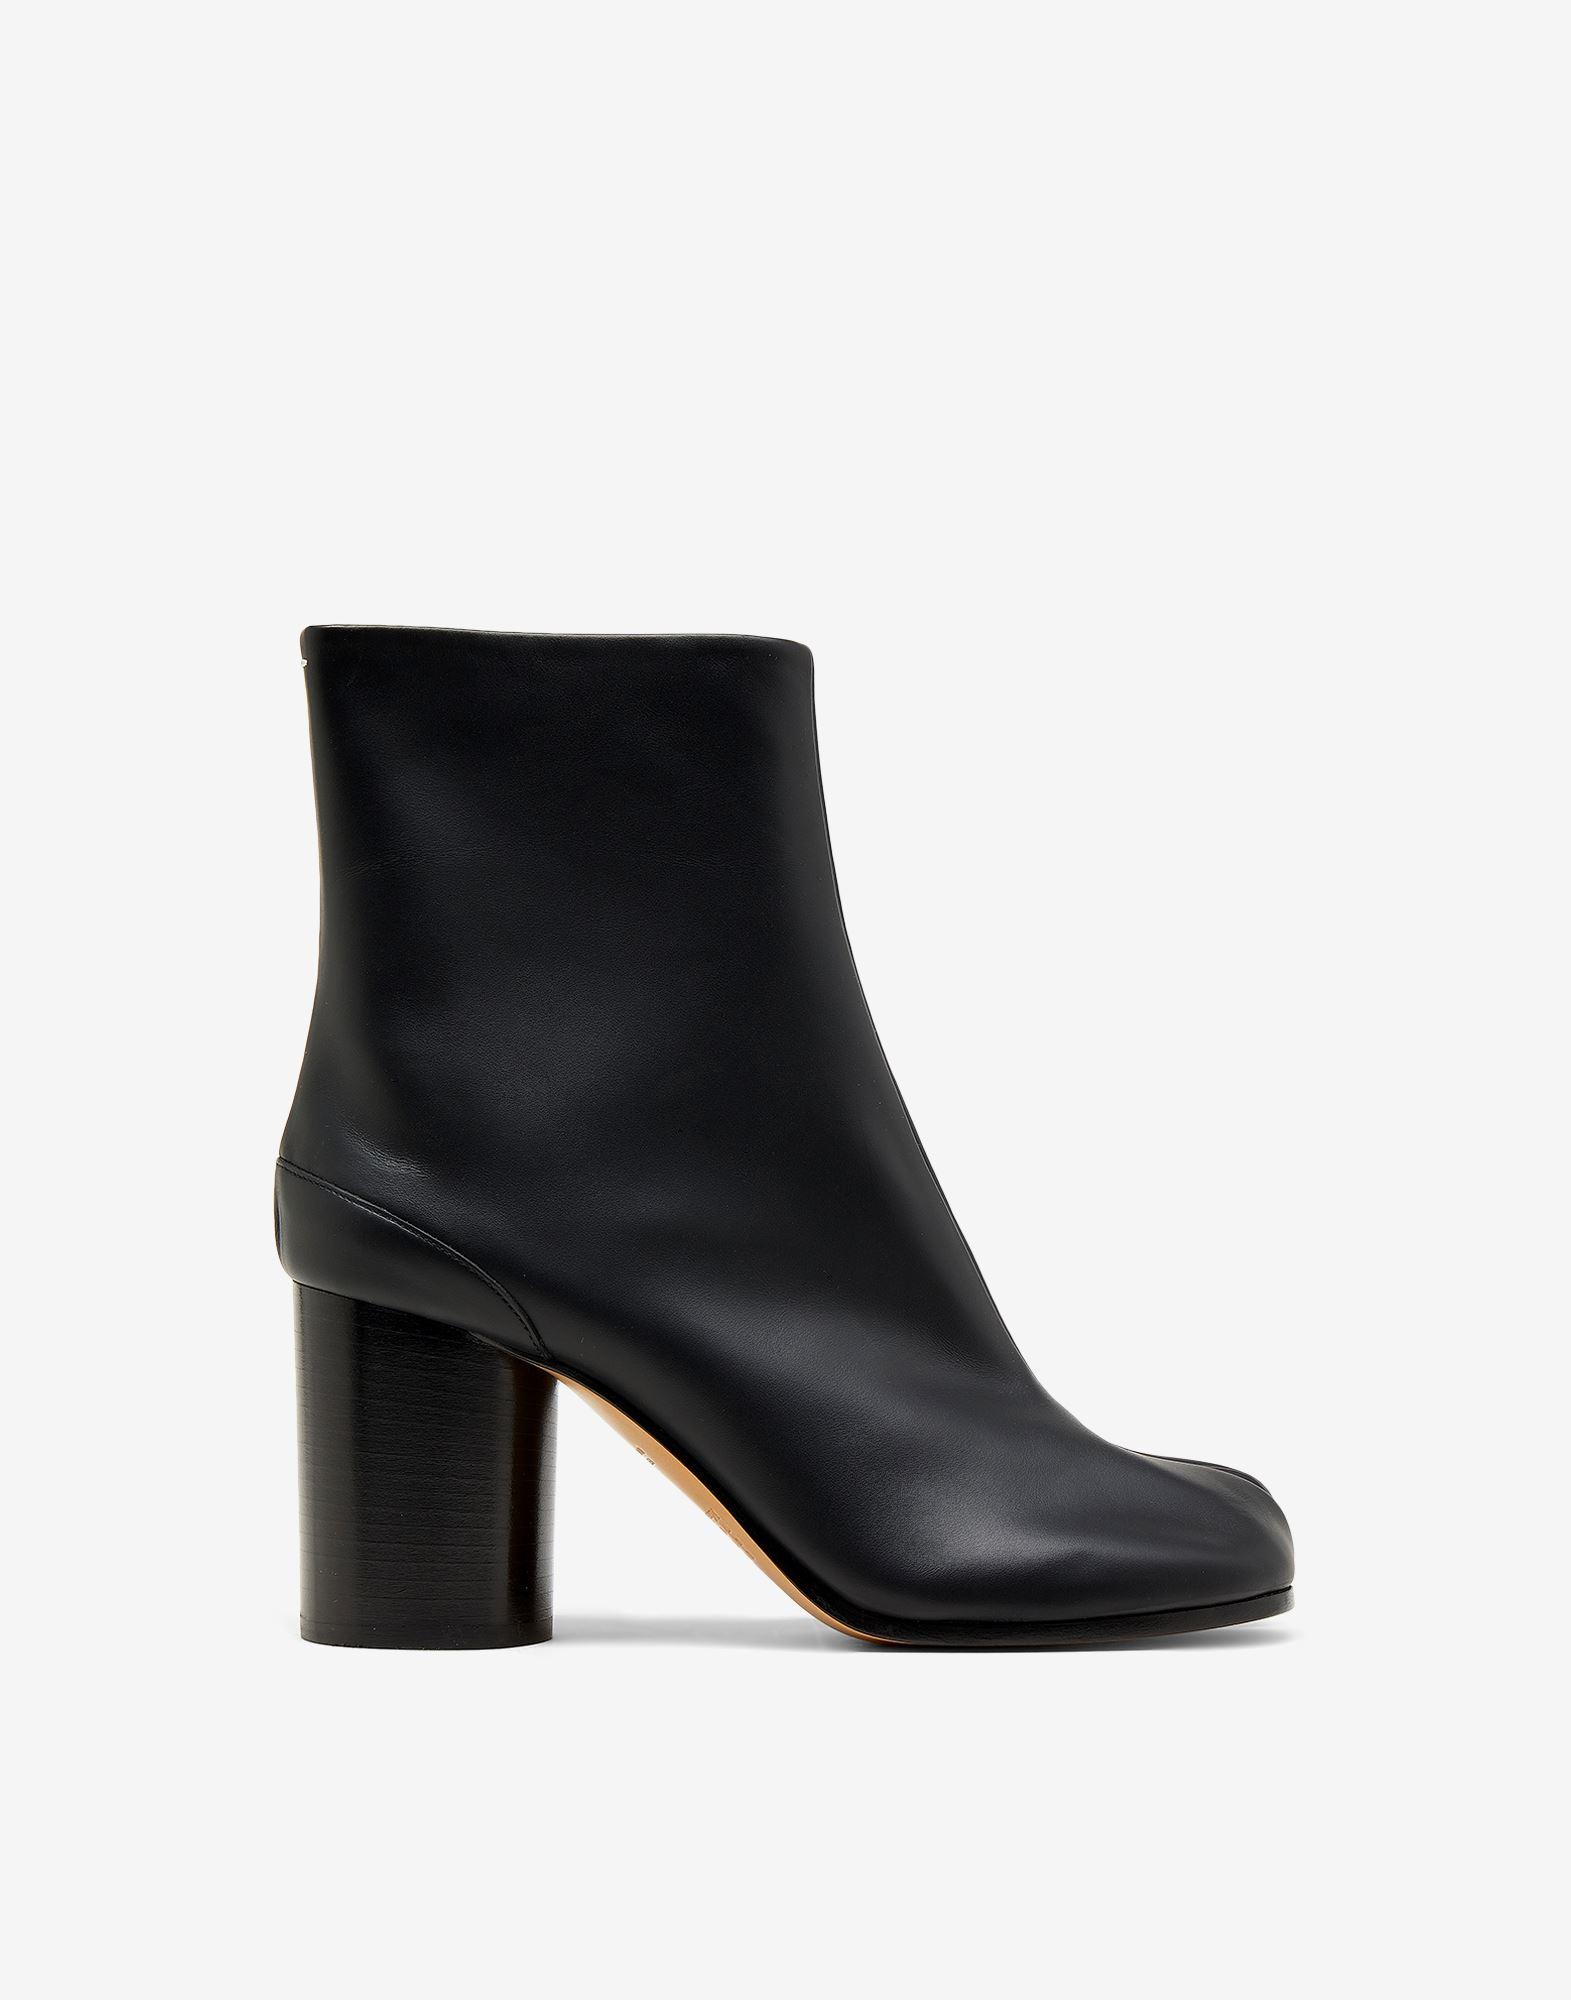 MAISON MARGIELA Calfskin Tabi boots Ankle boots Woman f